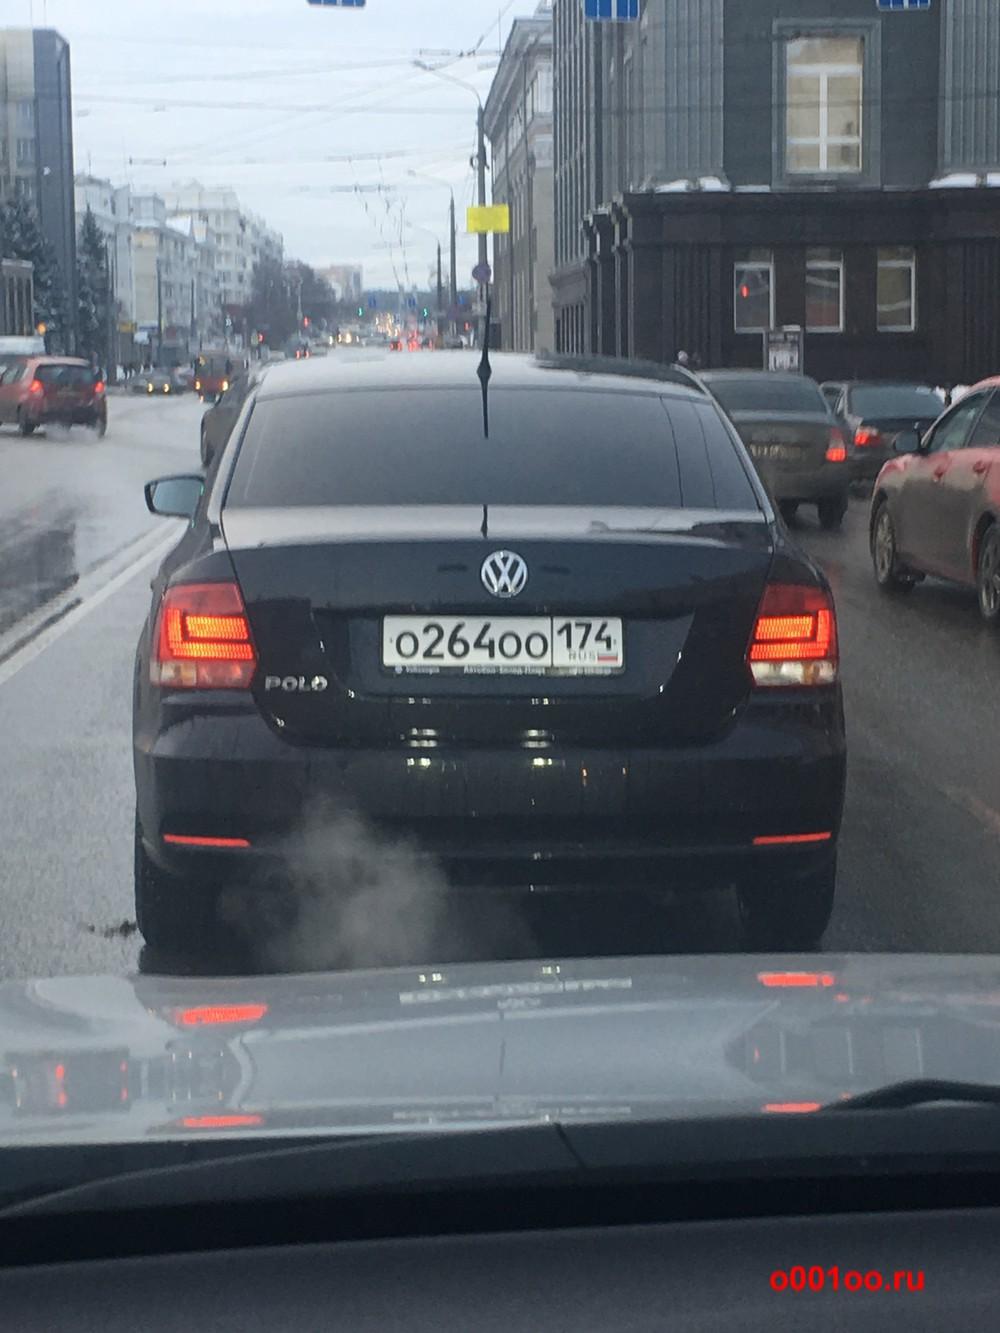 О264ОО174